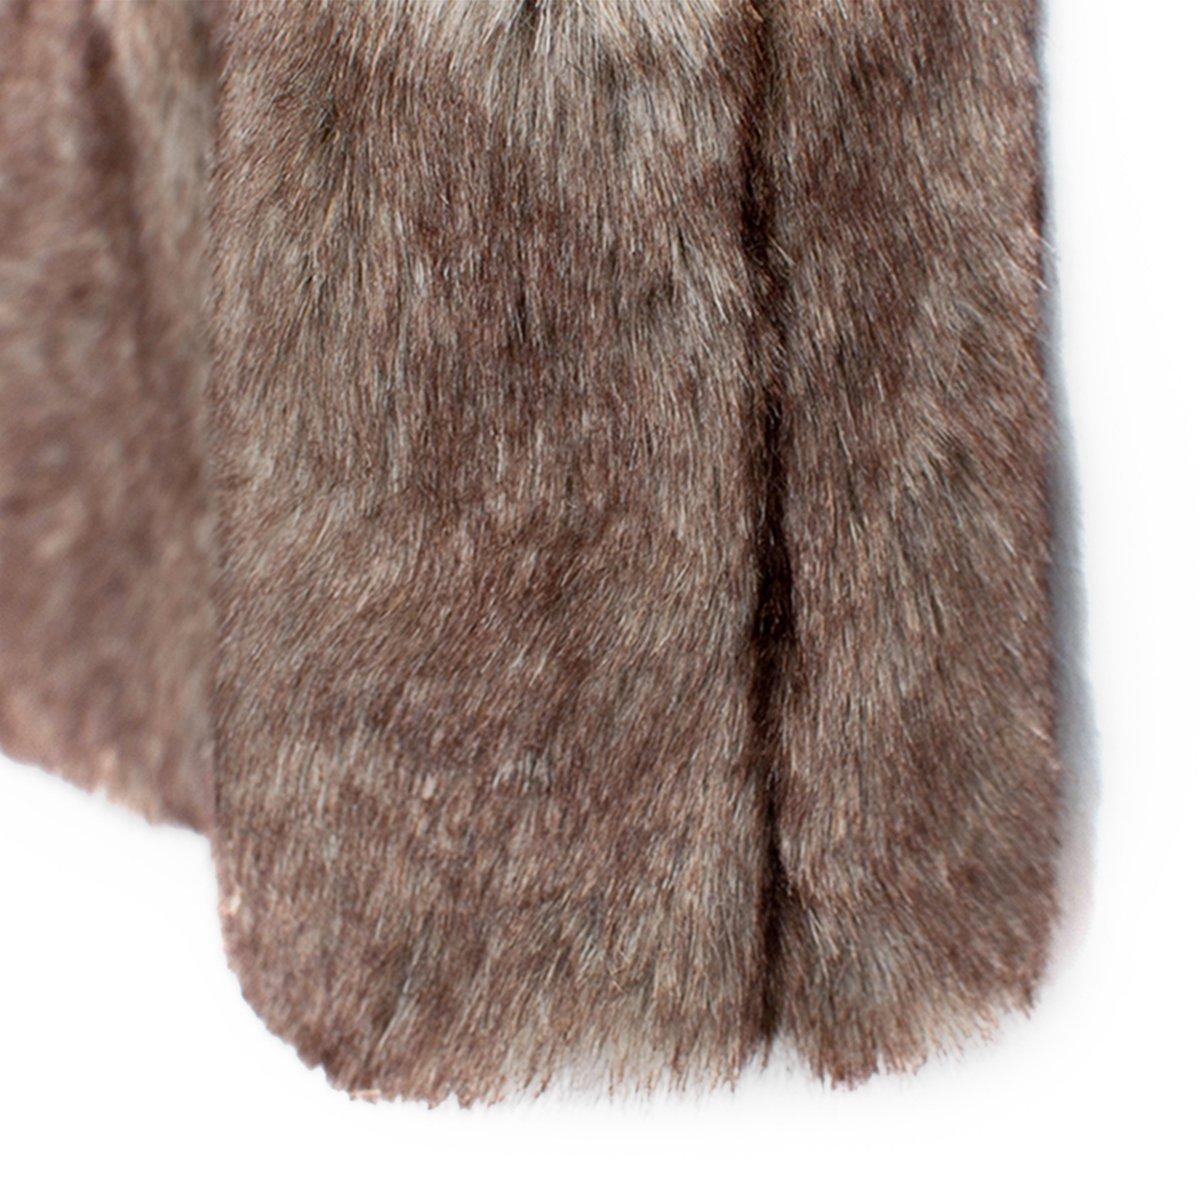 FUNOC Kids Baby Girls Faux Fur WaistCoat Fashion Short Vest Jacket Coat by FUNOC (Image #1)